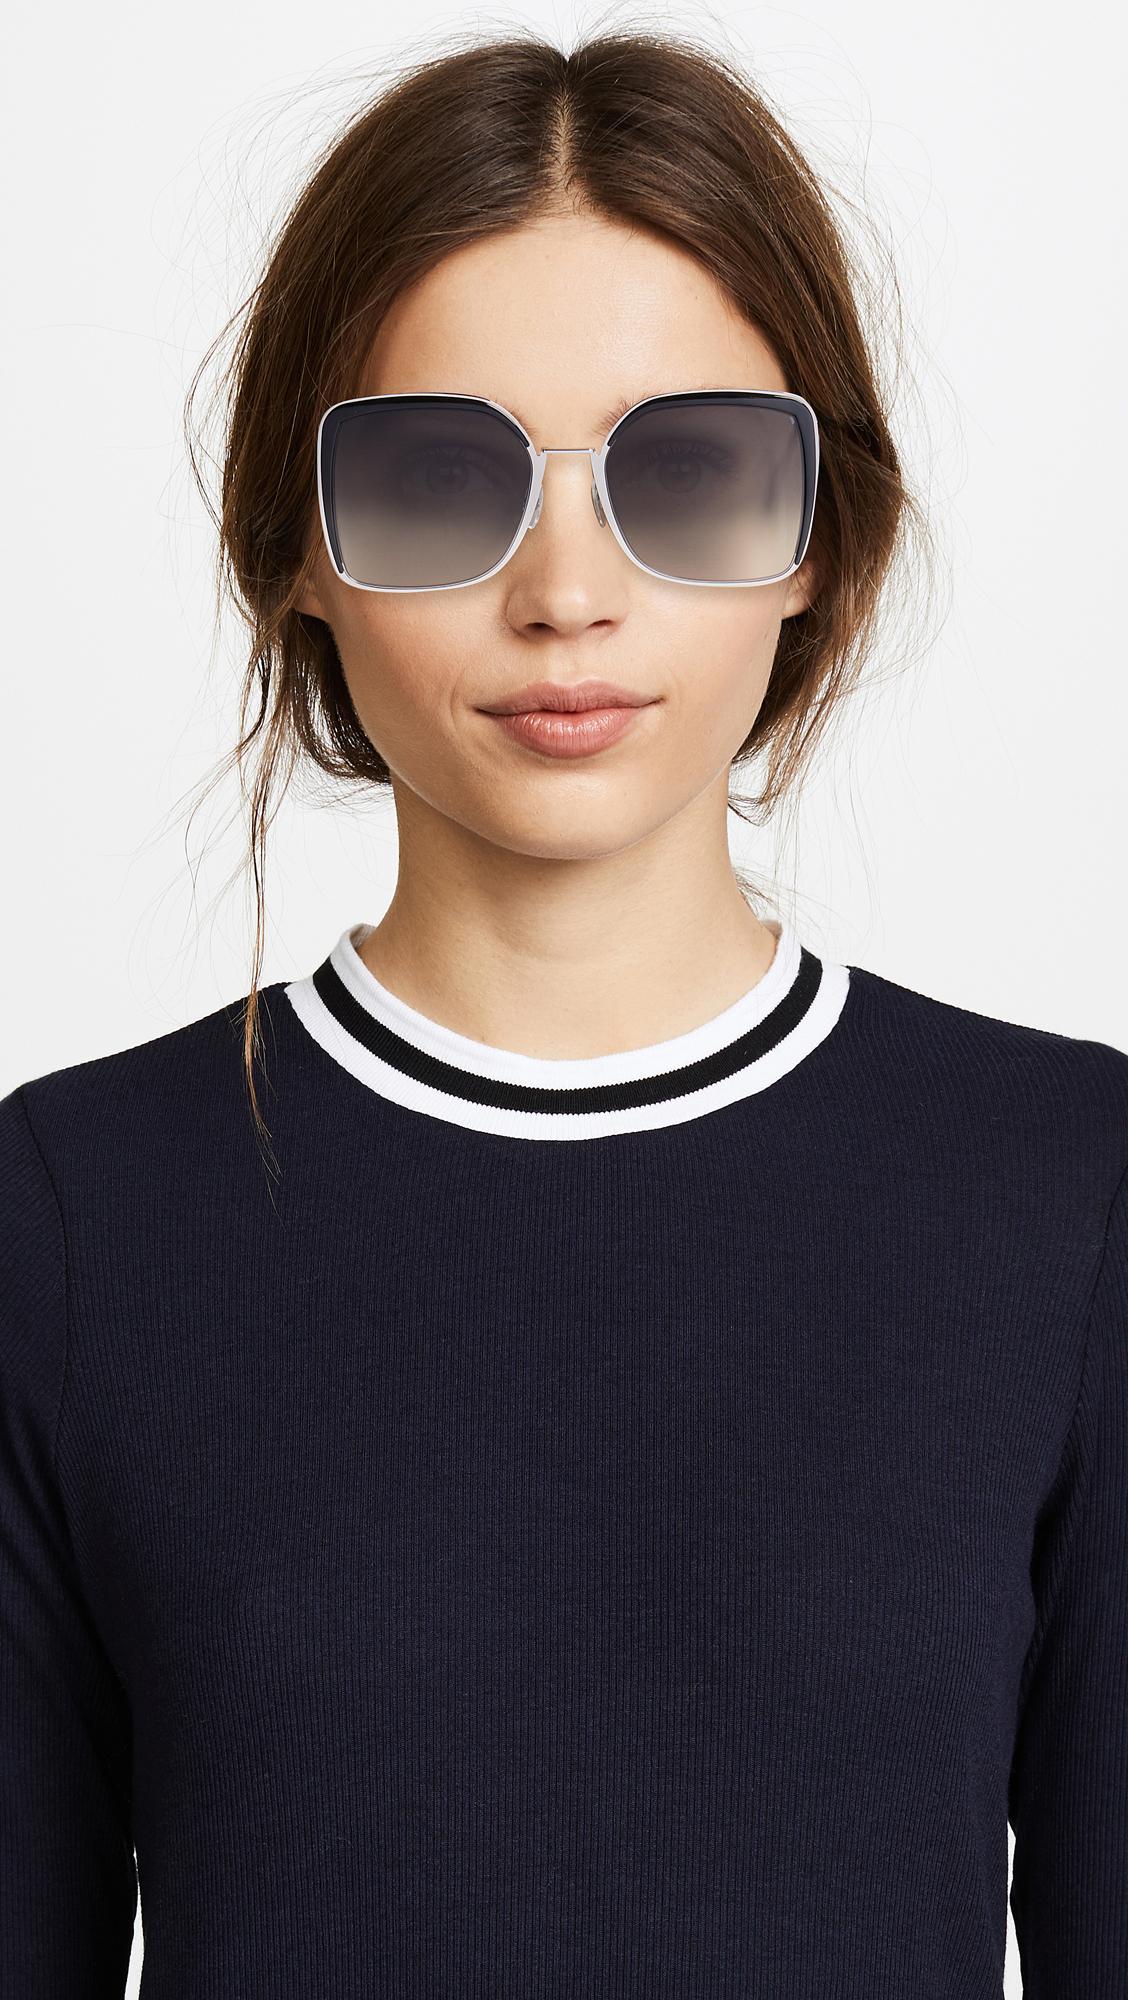 f3f97fbaeacf8 Fendi Square Oversized Sunglasses